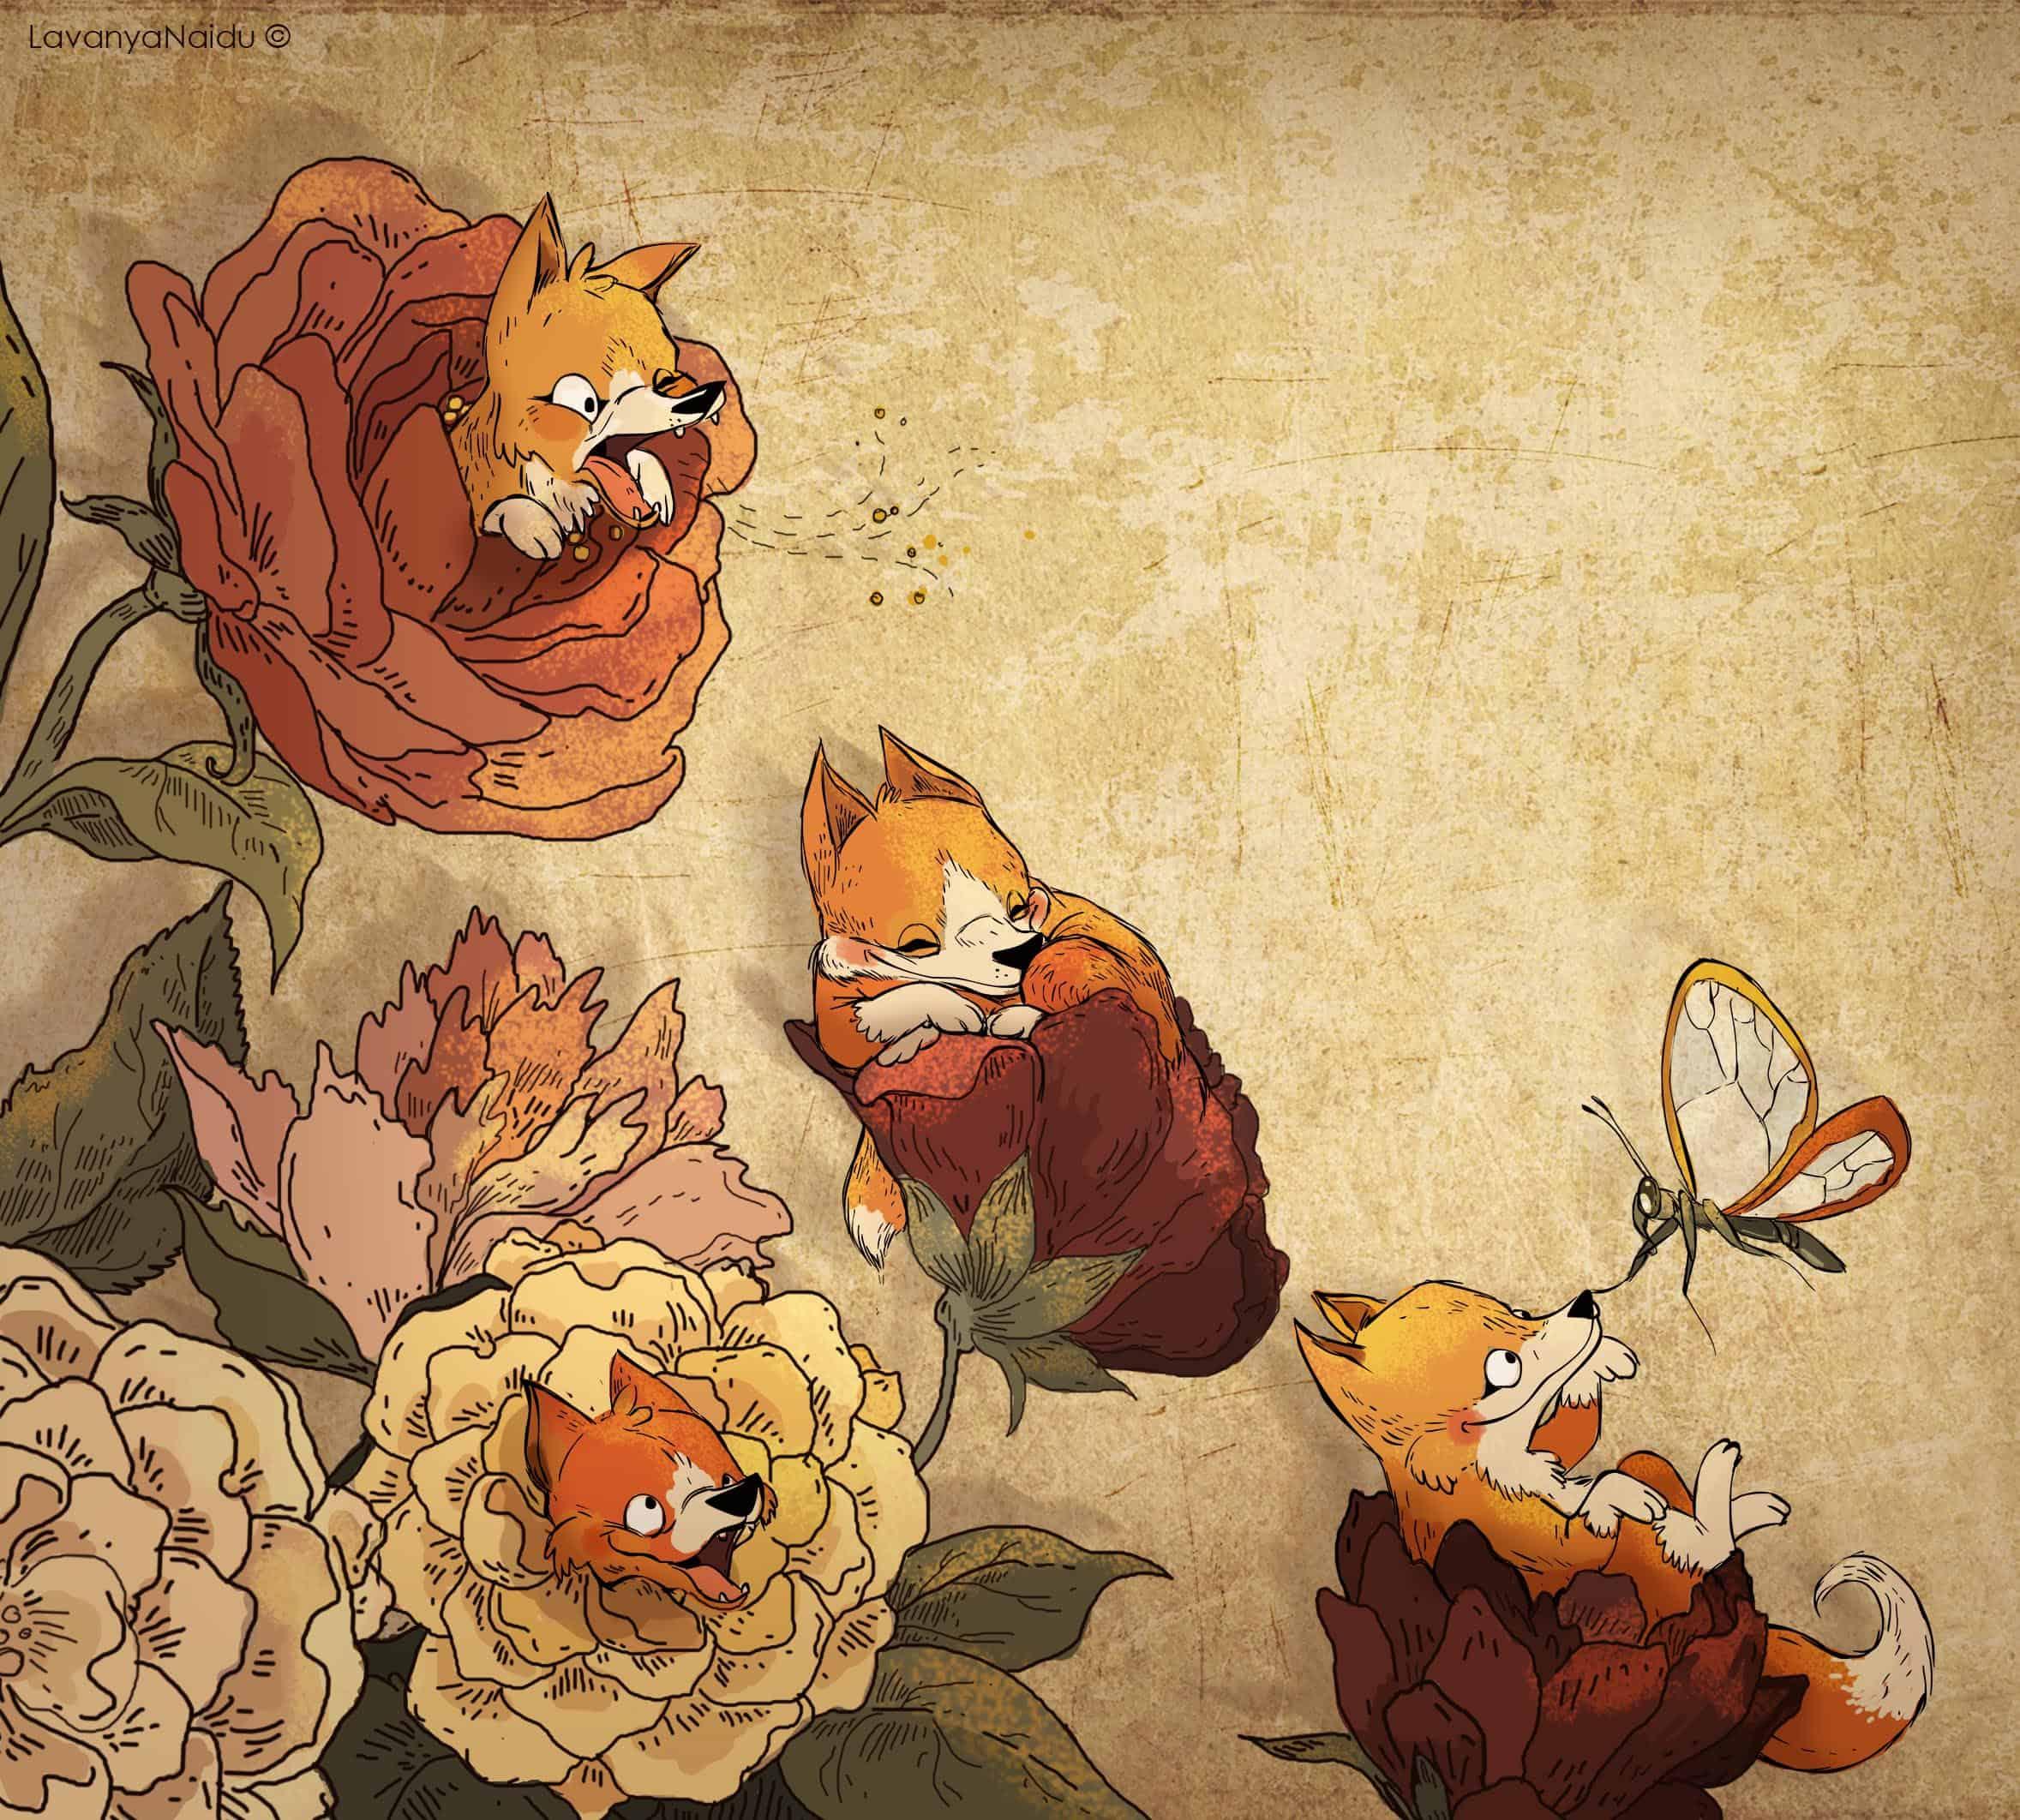 Interview with Animator and Illustrator Lavanya Naidu